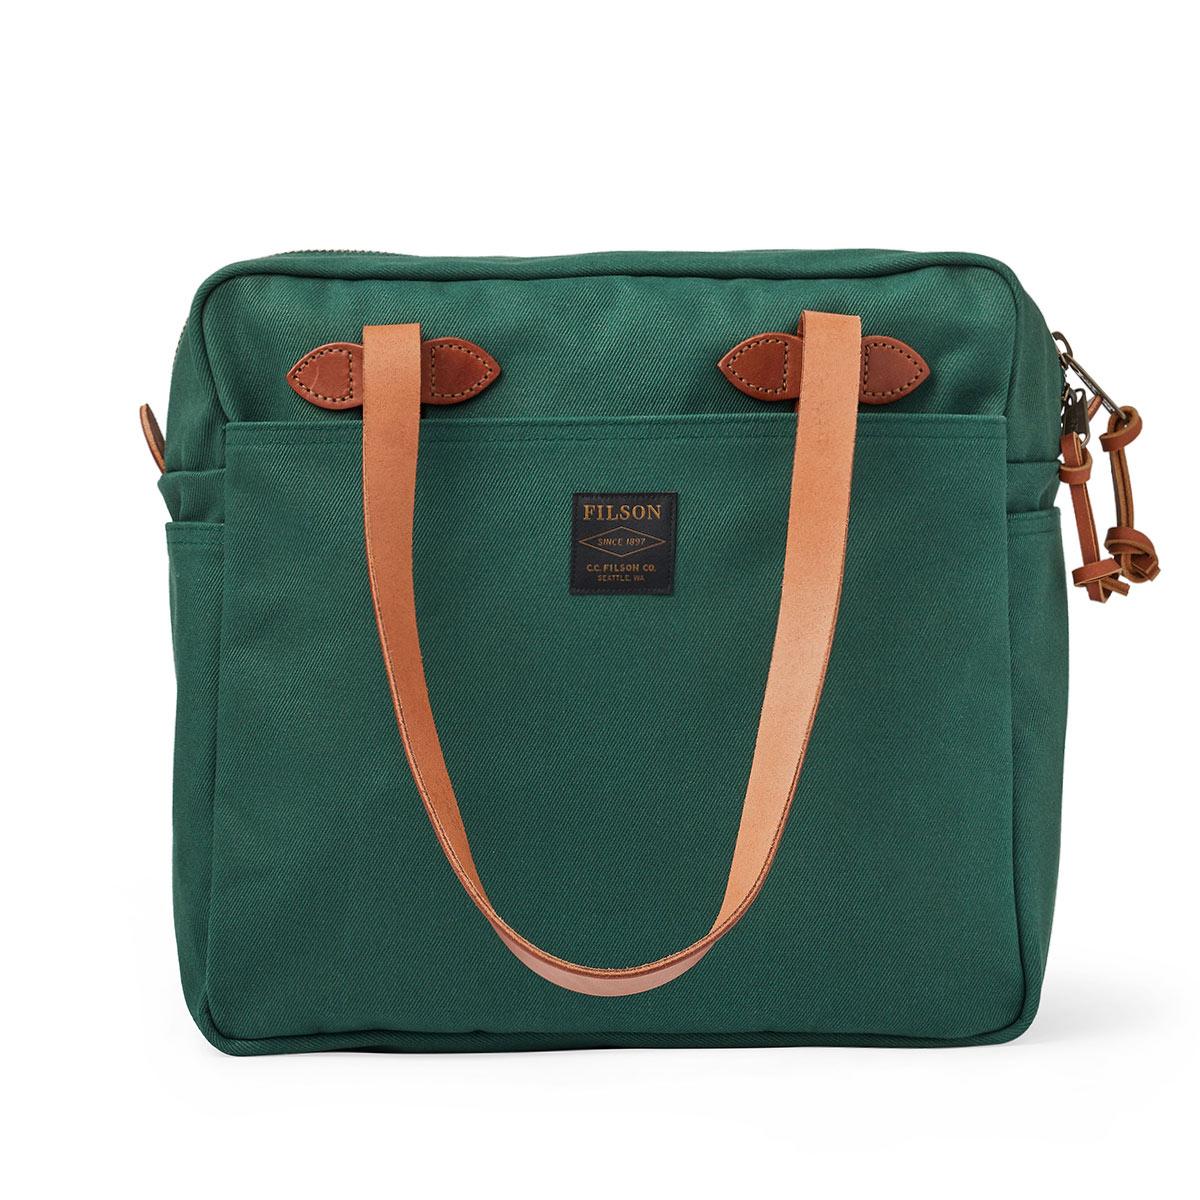 Filson Rugged Twill Tote Bag with Zipper 20192728-Hemlock